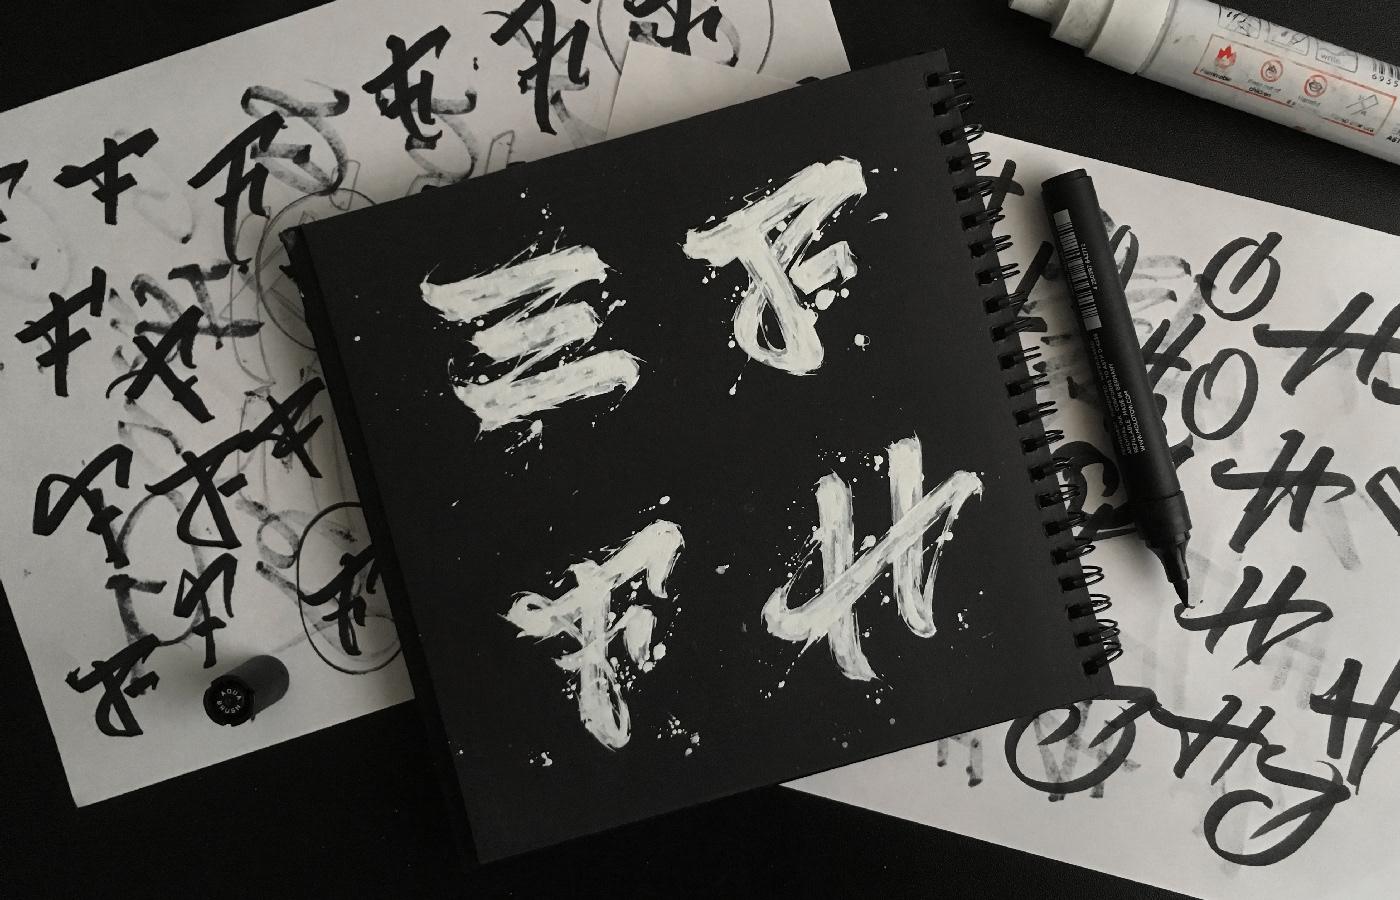 36daysoftype 36days typography   lettering Calligraphy   texture abrakadabra adobe type ink